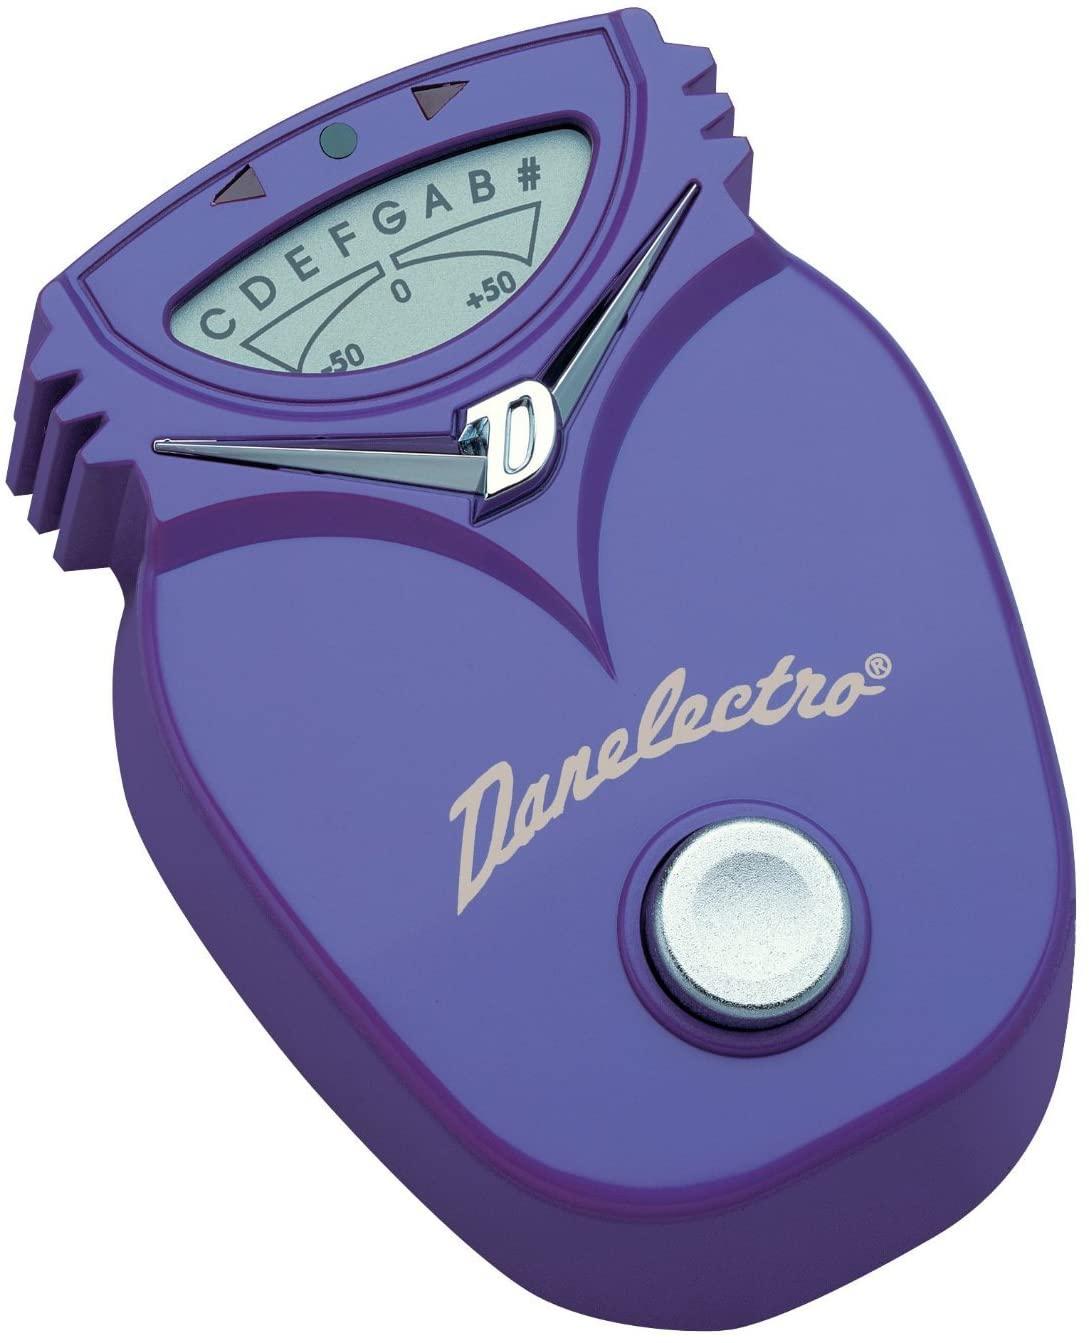 Danelectro DJ-25 Chromatic Tuner Pedal